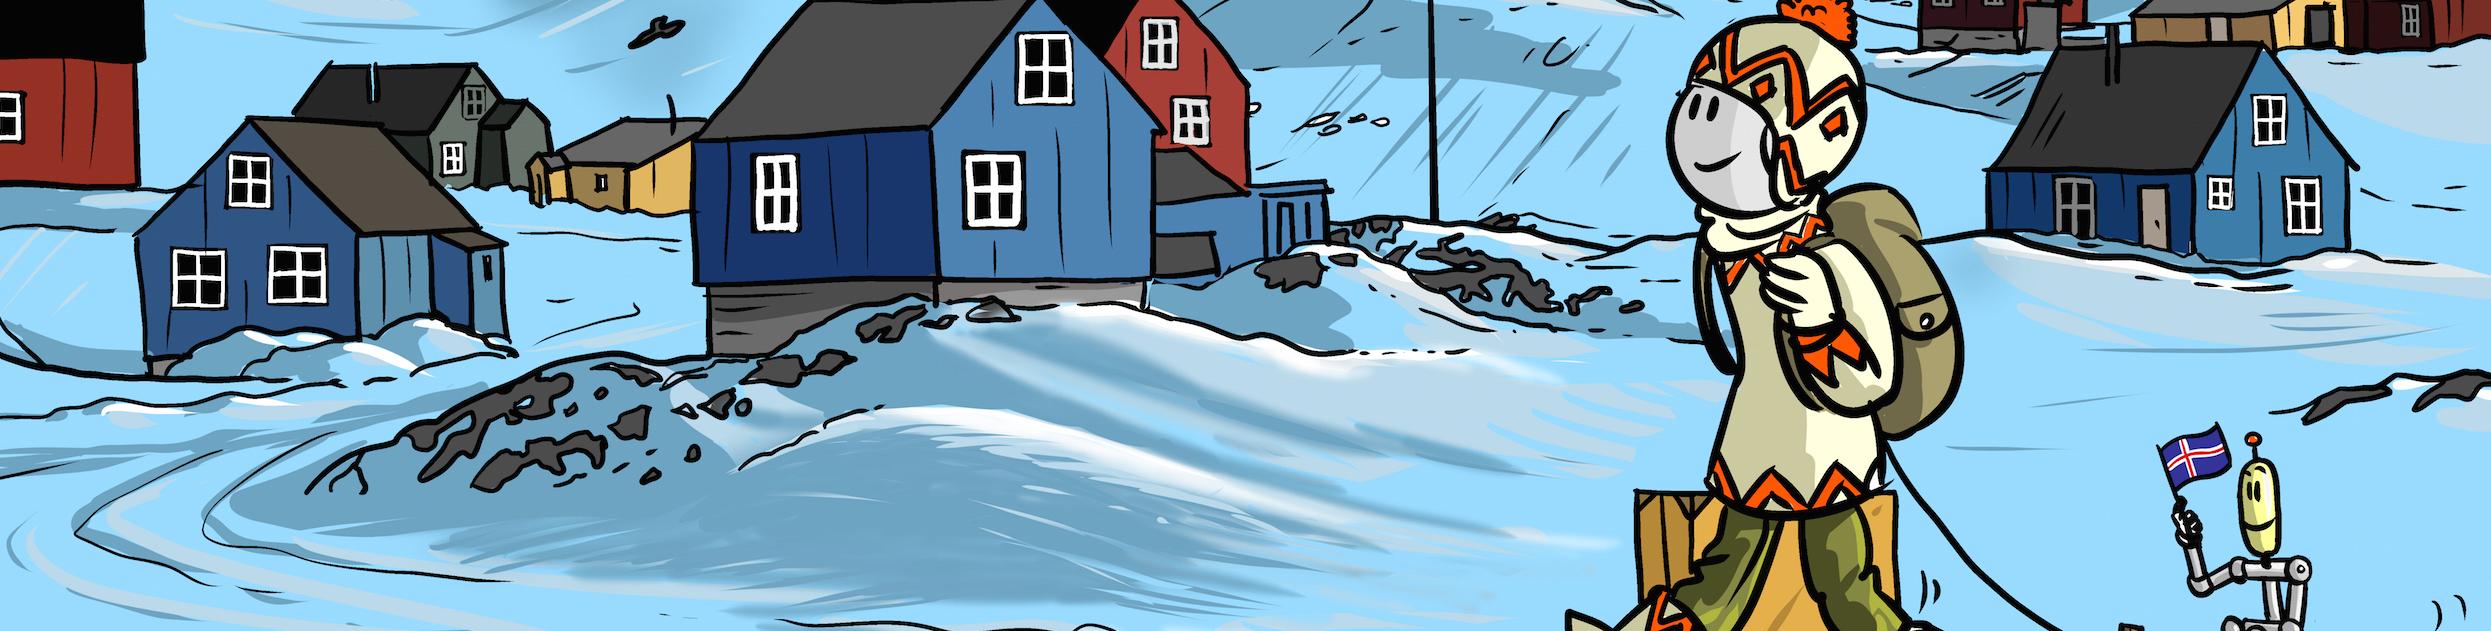 Tirobot en Islande le Step by Step